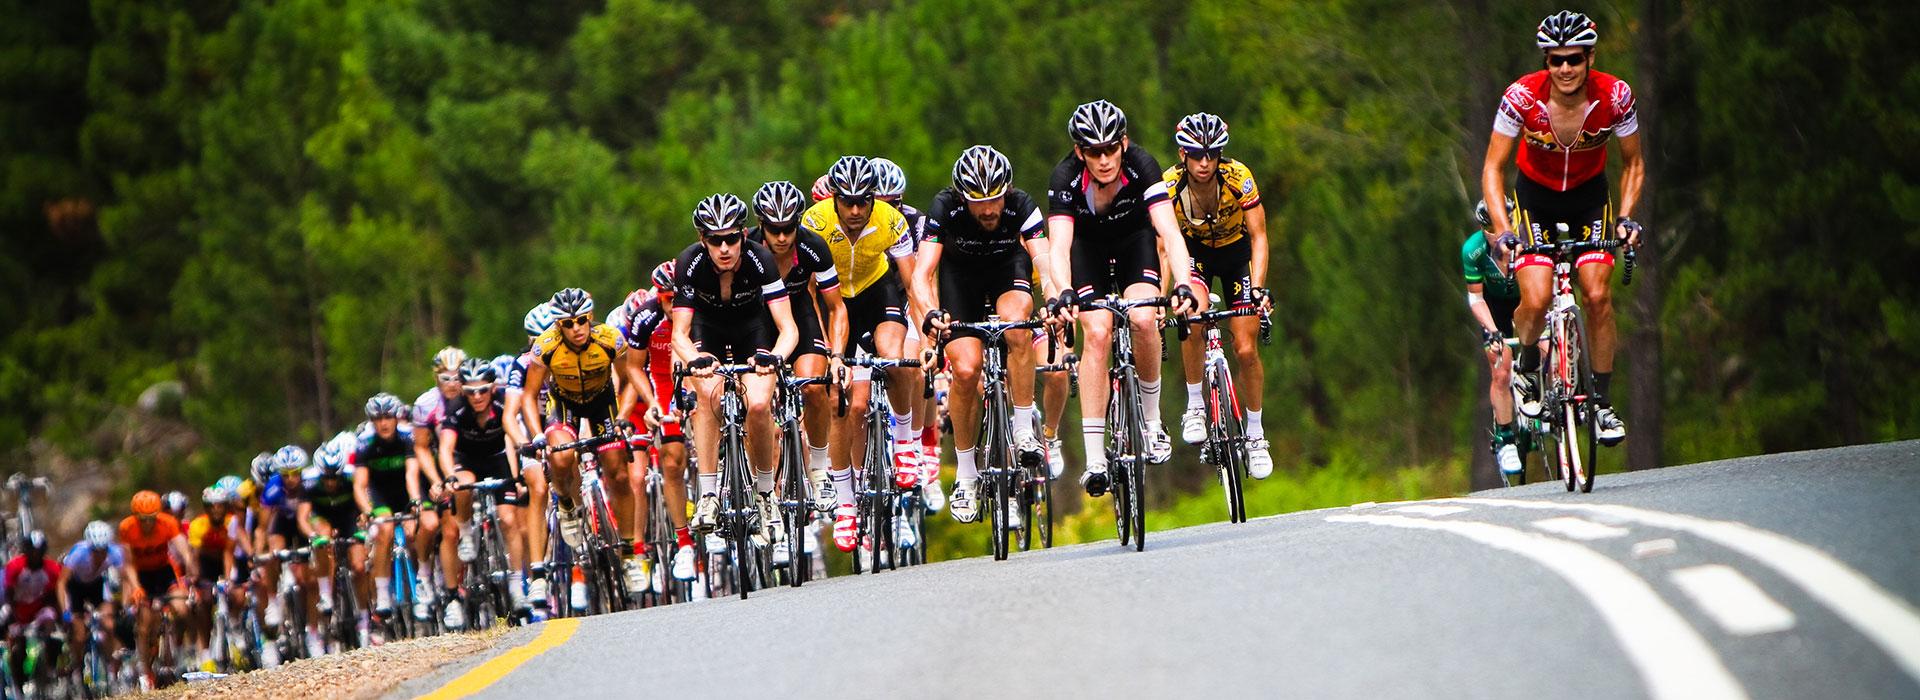 sistime-torneio-capital-ciclismo-unb